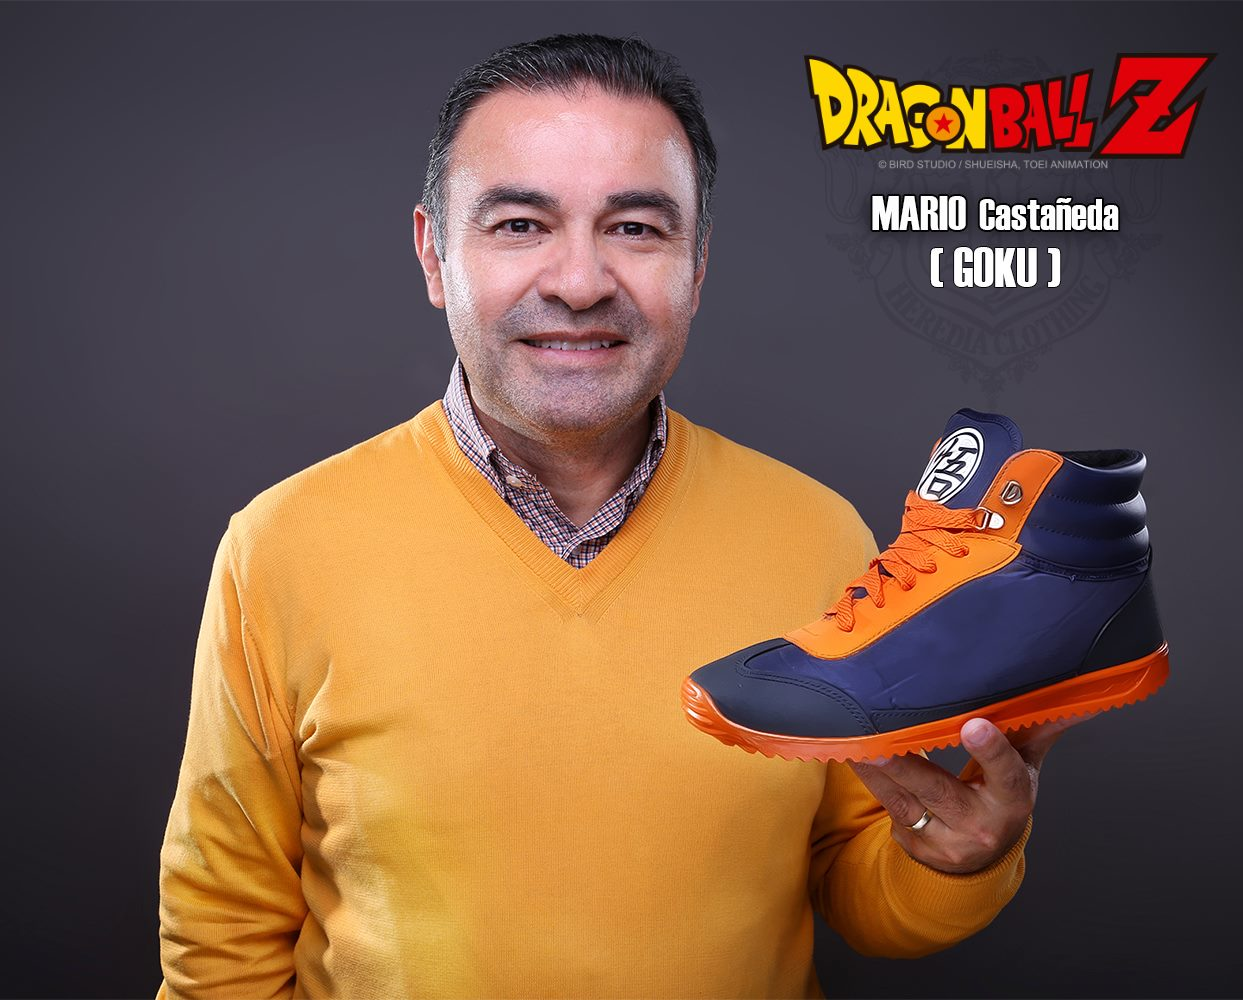 ... Heredia Clothing  Dragon Ball Z Sneakers - Mario Castañeda 61faa690d